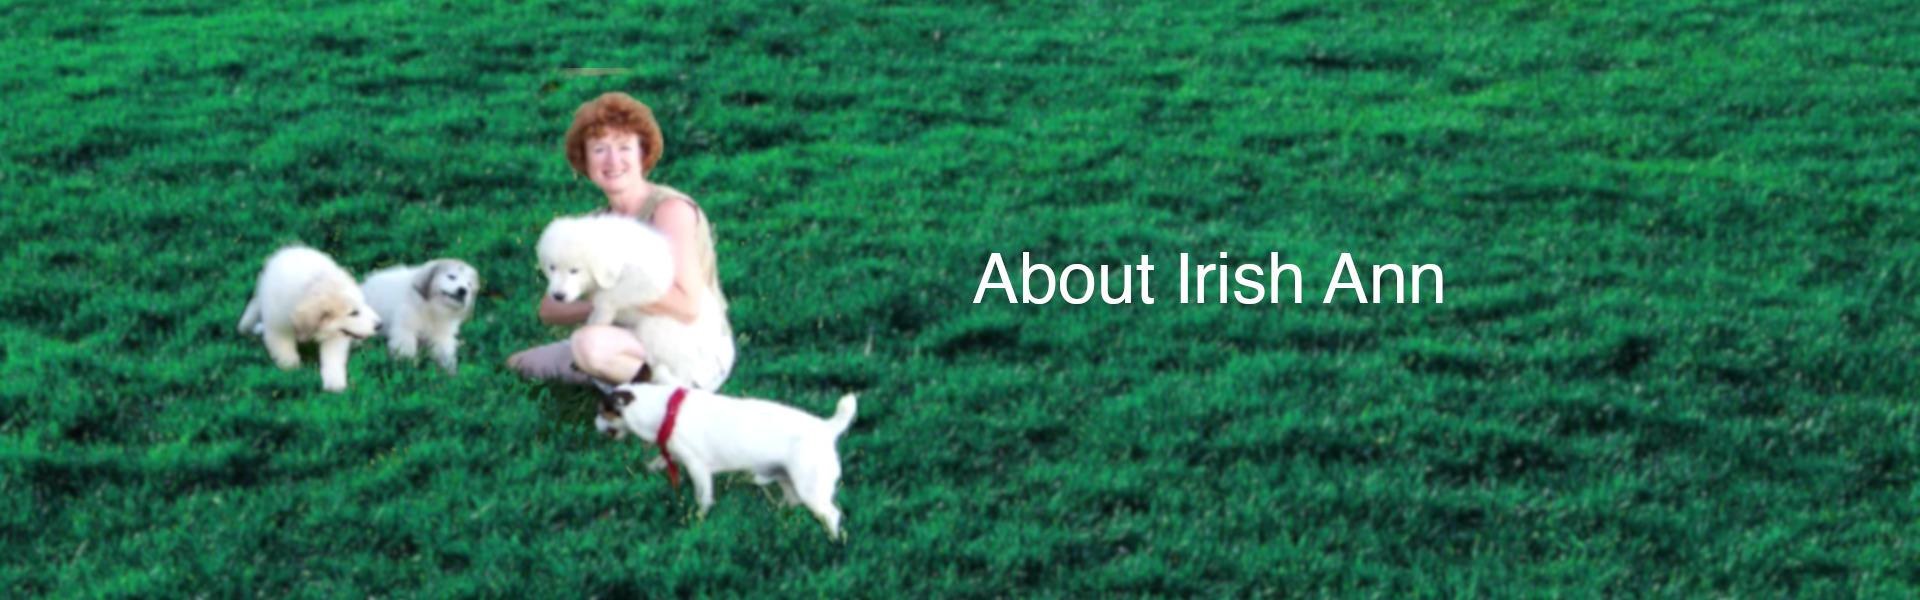 link to About Irish Ann